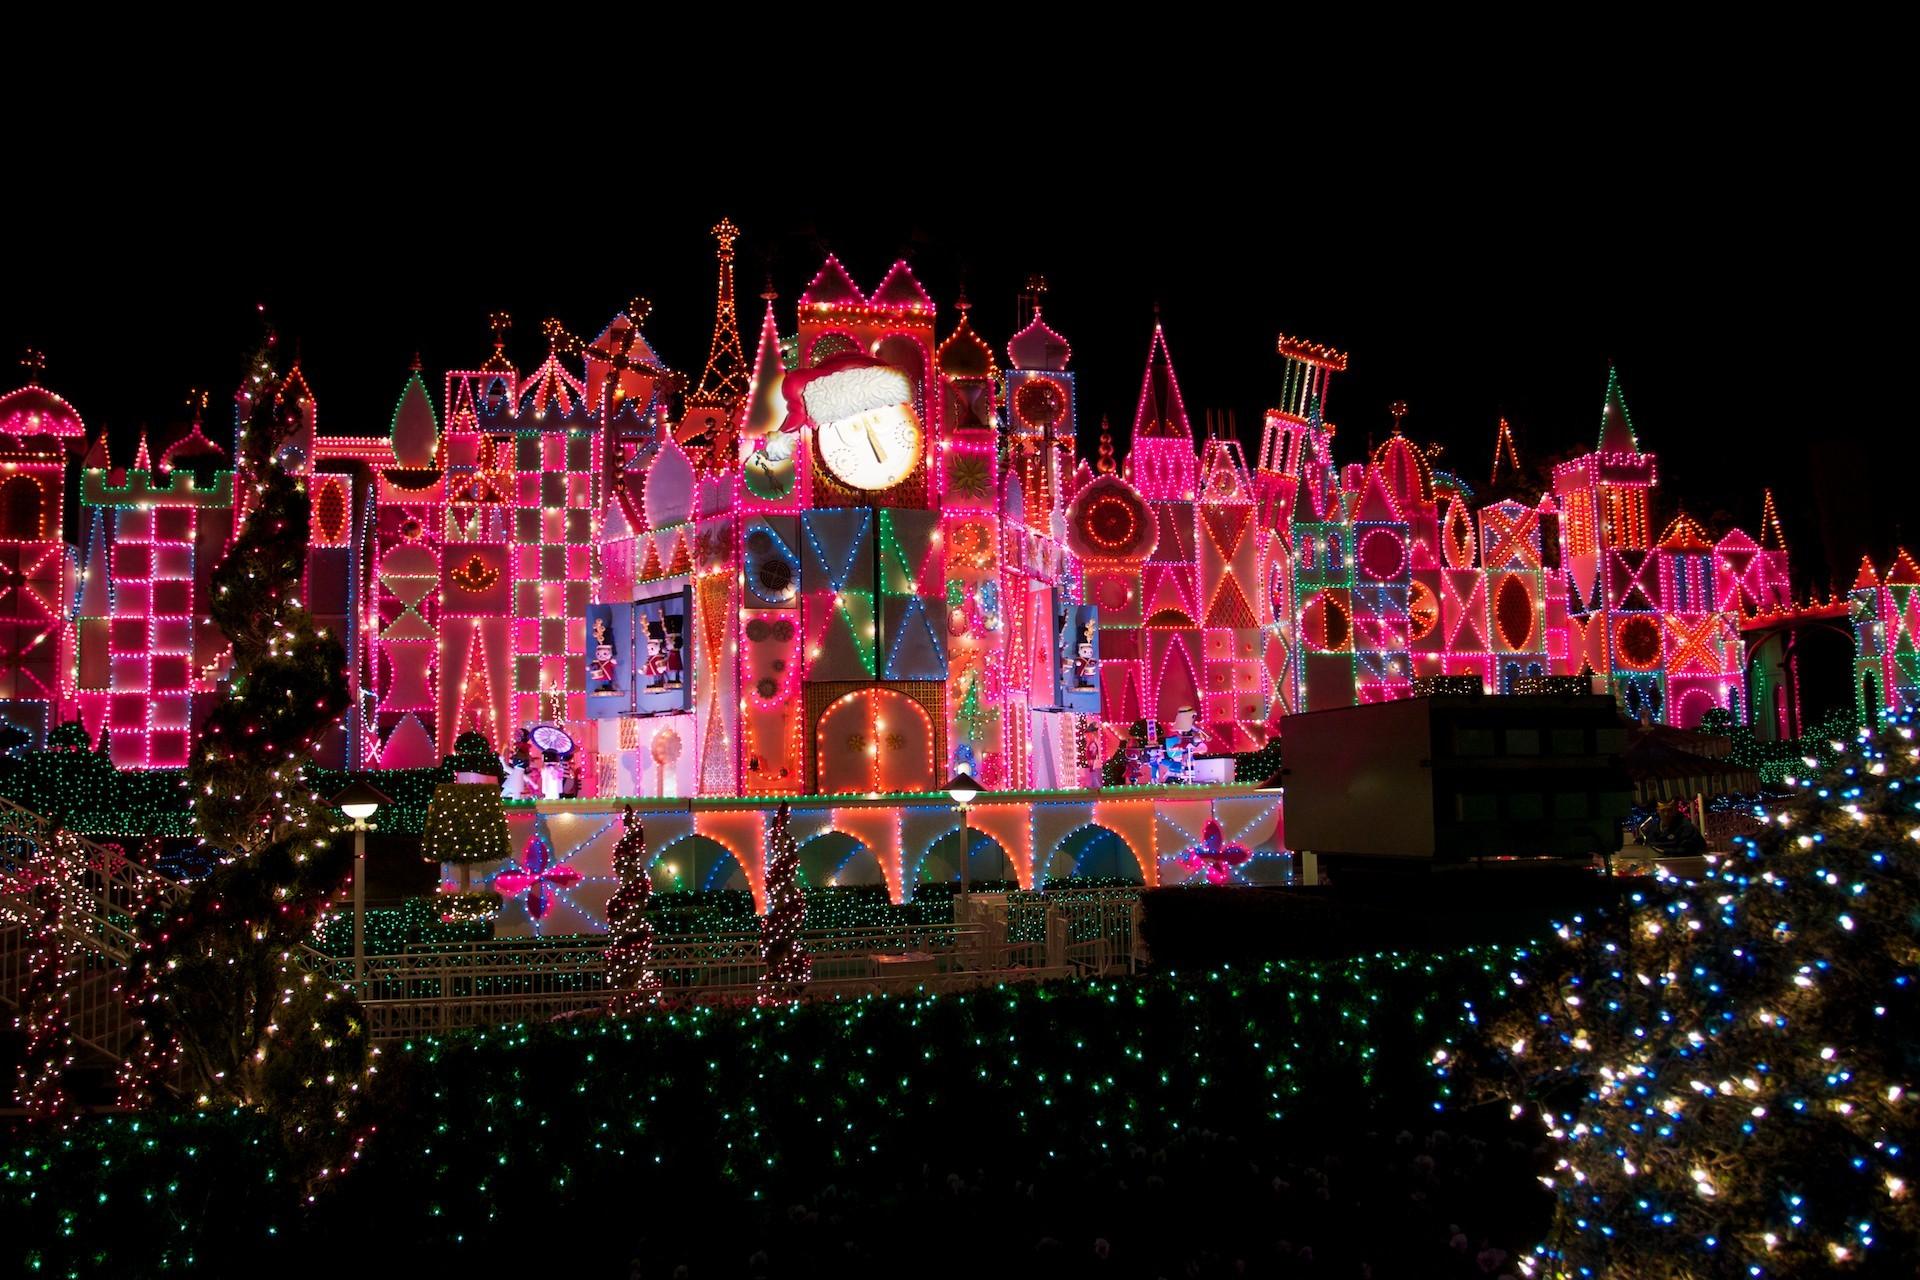 Go Back > Images For > Disney Castle Christmas Wallpaper